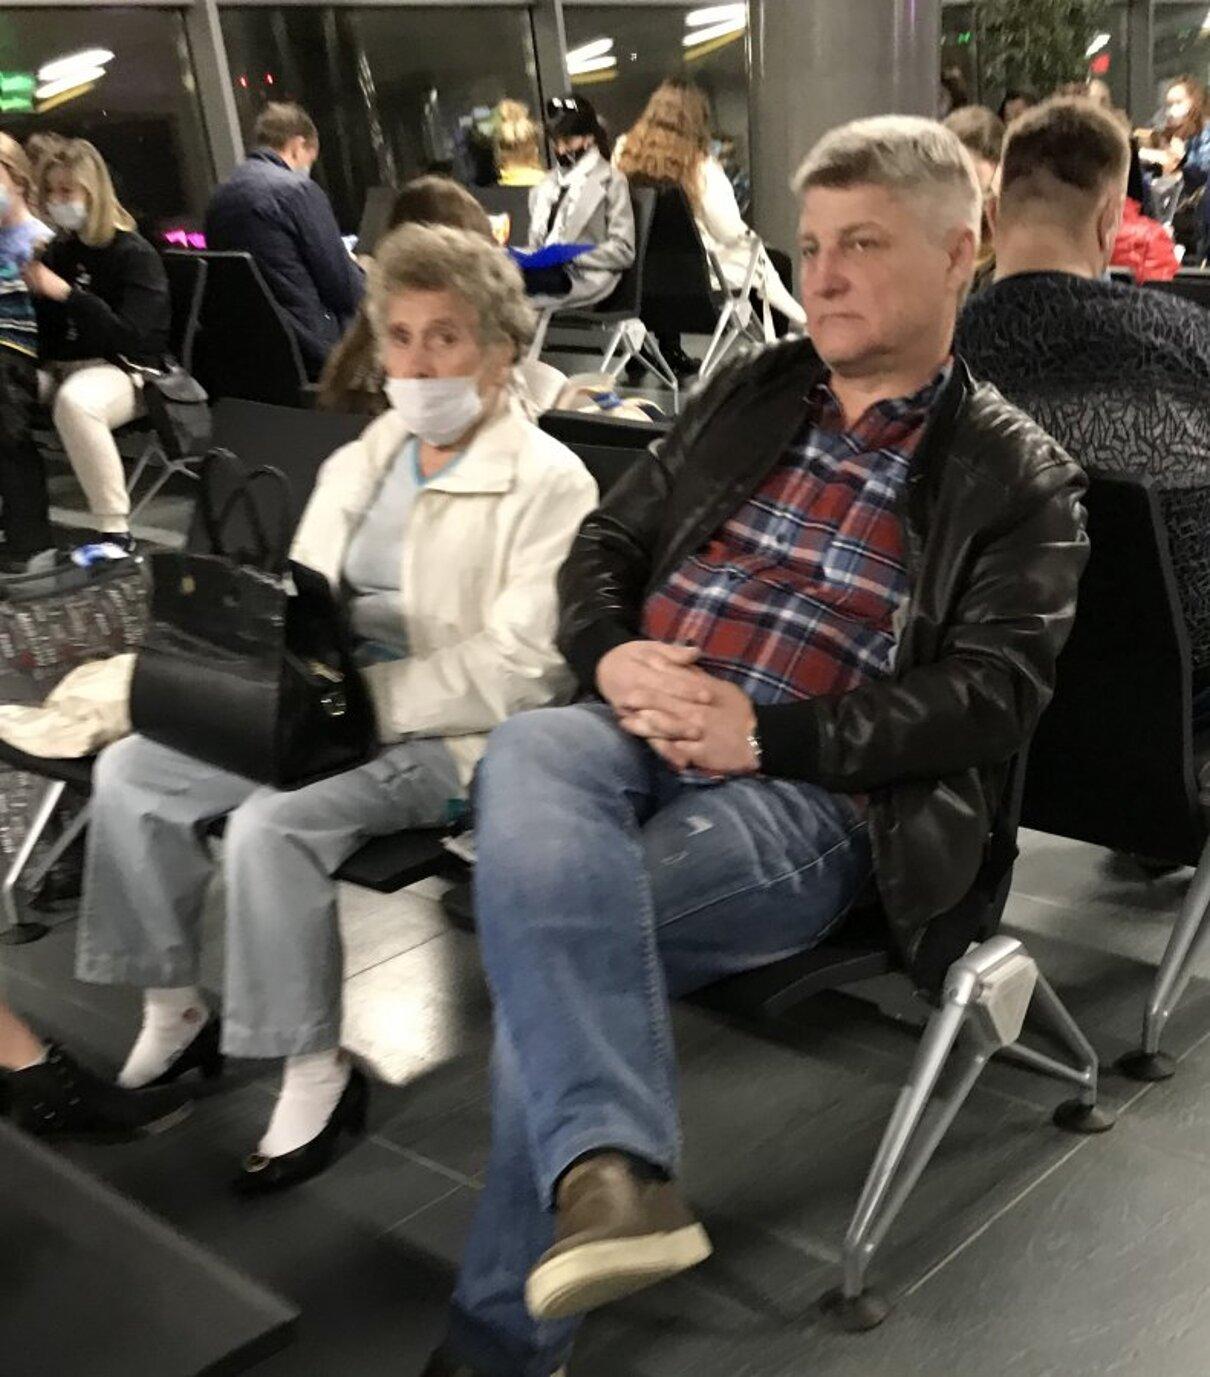 Жалоба-отзыв: Хам с аэропорта Перми 20.04.21 - Хам.  Фото №2